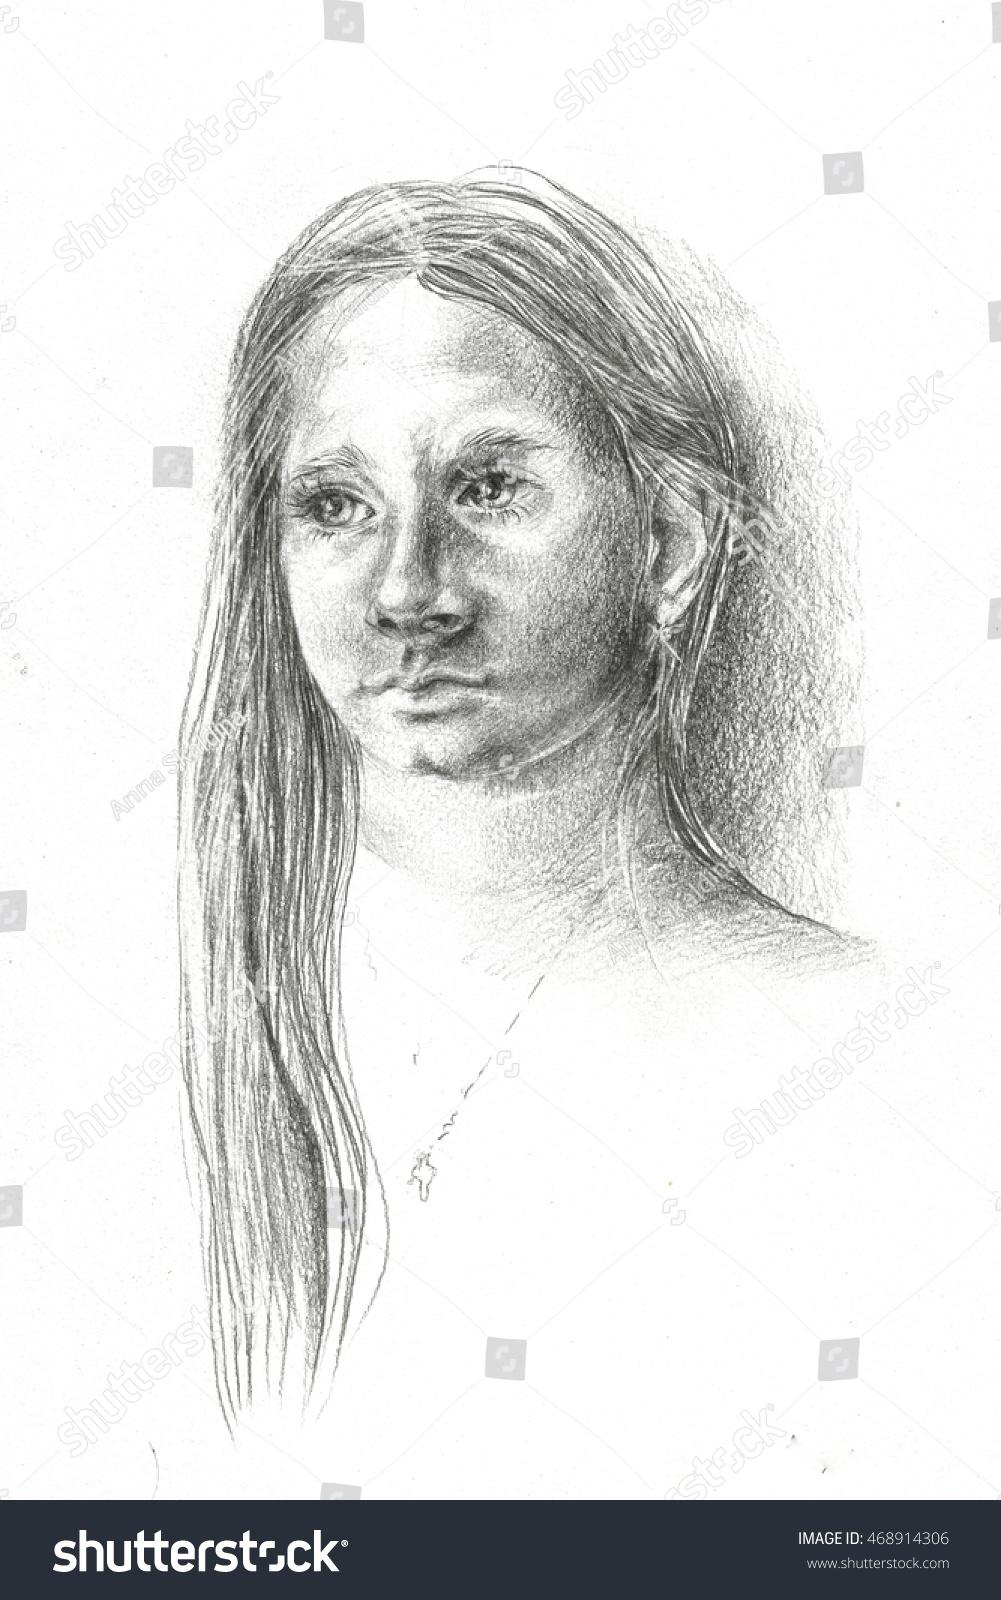 Little beautiful girl sketch hand drawn illustration